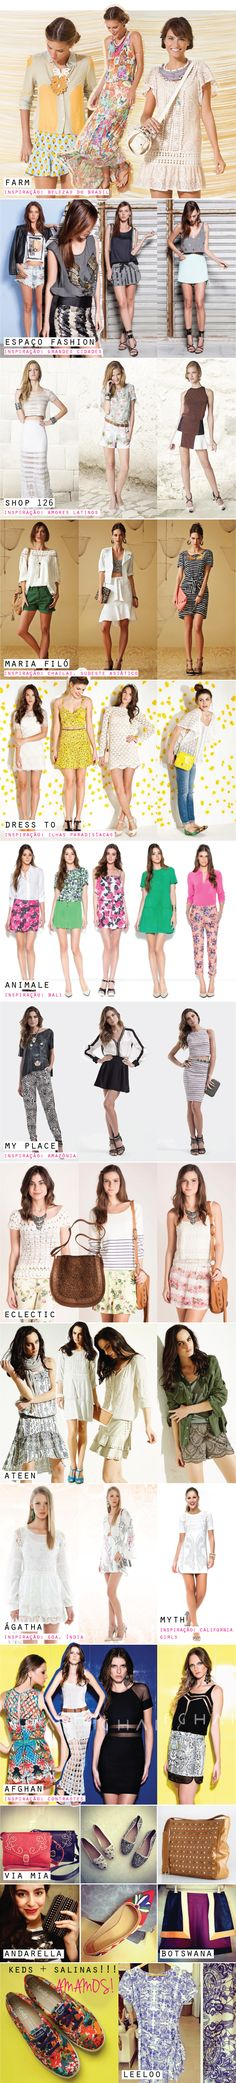 lojas-rio-colecao-verao-2014-marcas-cariocas-farm-espaco-fashion-maria-filo-dress-to-shop-126-moda-fashion-agatha-afghan-my-place-myth-via-mia-andarella-salinas-animale-eclectic-ateen-botswana-inspiracao-blog-dica